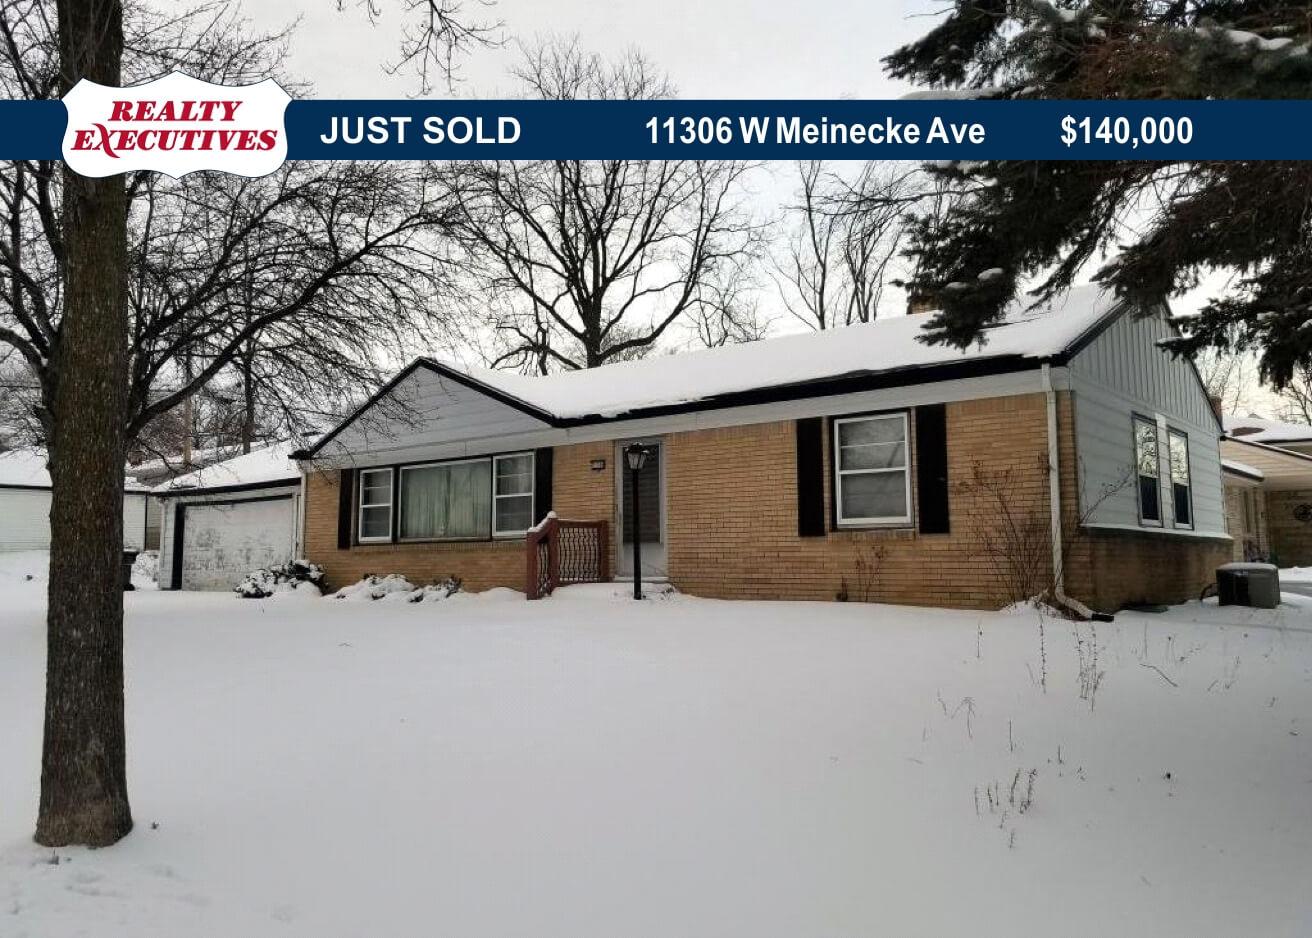 11306 W. Meinecke Ave. Sold